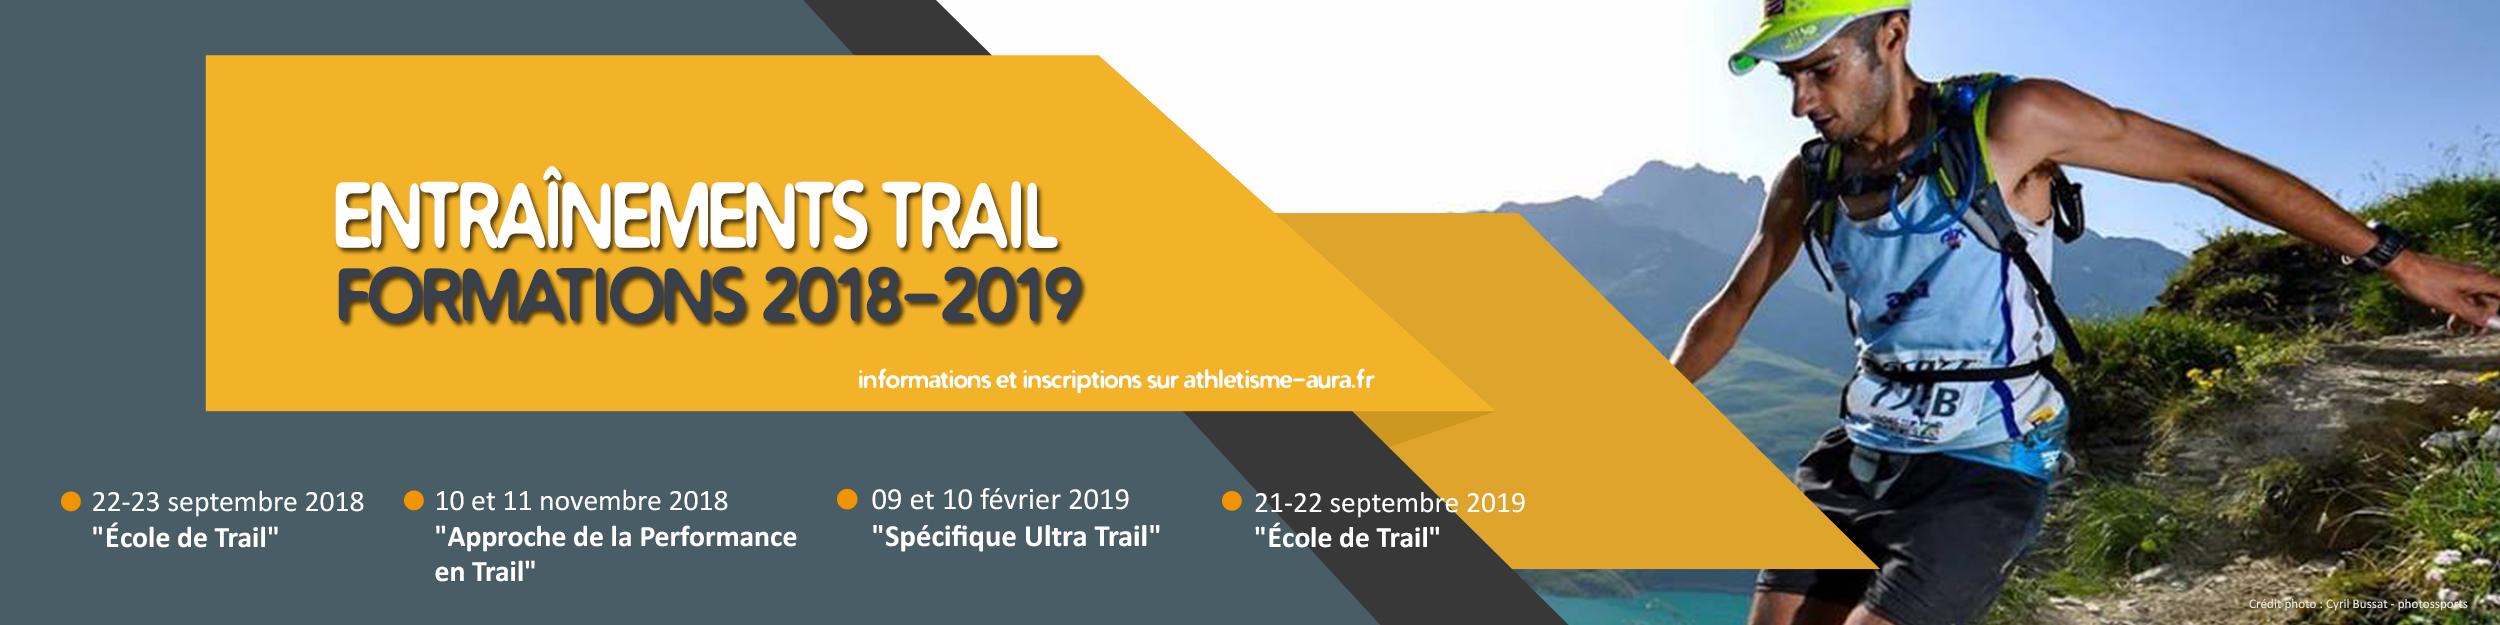 Calendrier Trail Auvergne.Formation Entrainement Trail A Chacun Son Athle